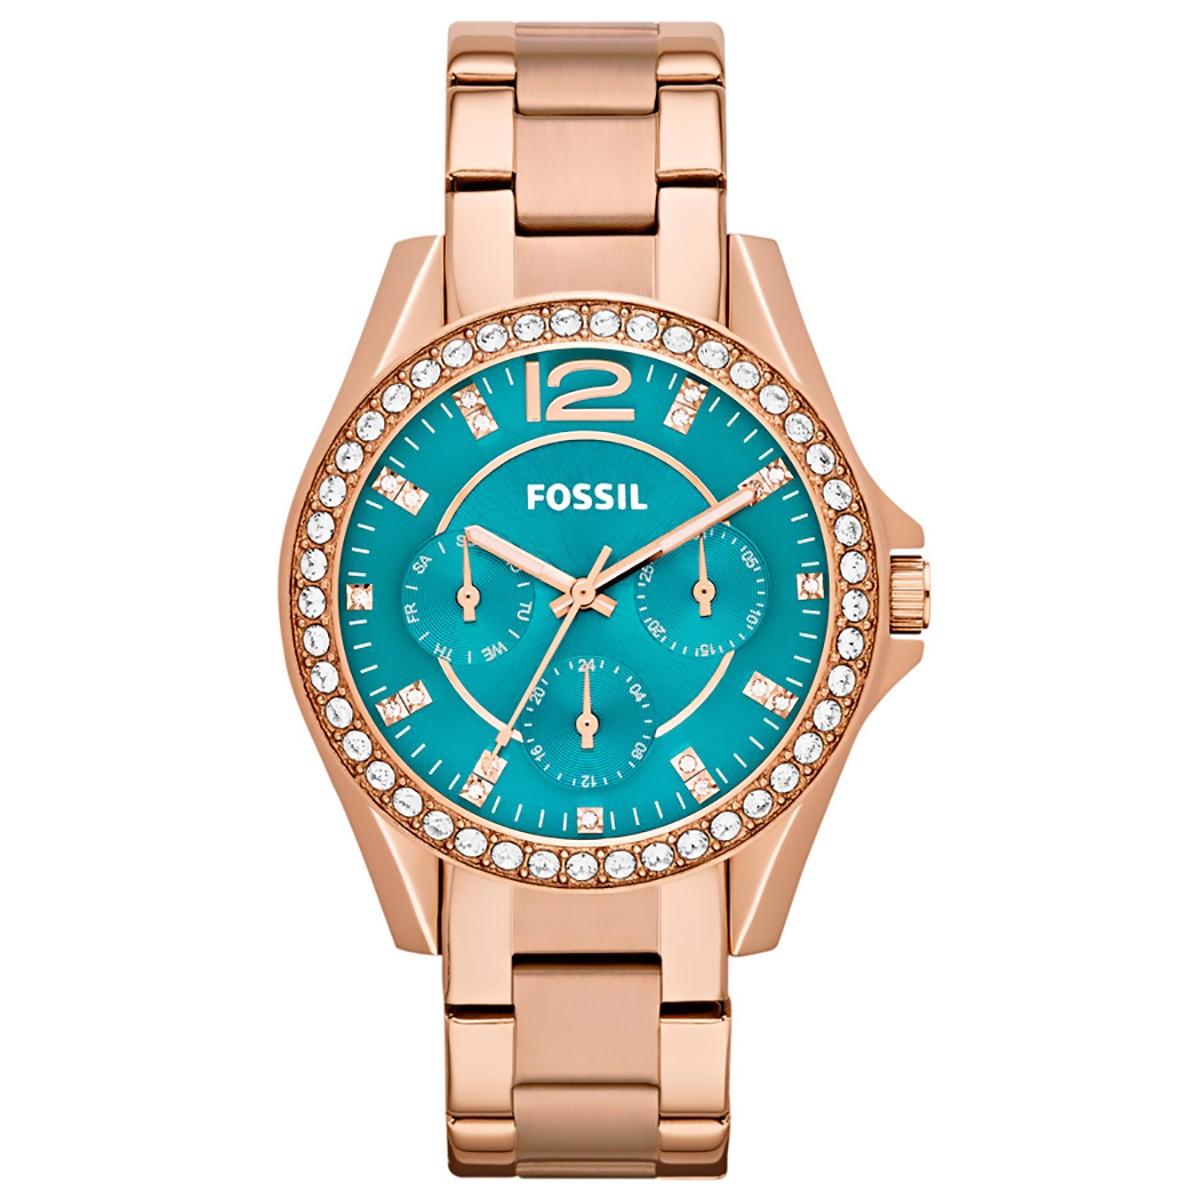 62b770022c7 Compre Relógio Fossil Riley em 10X